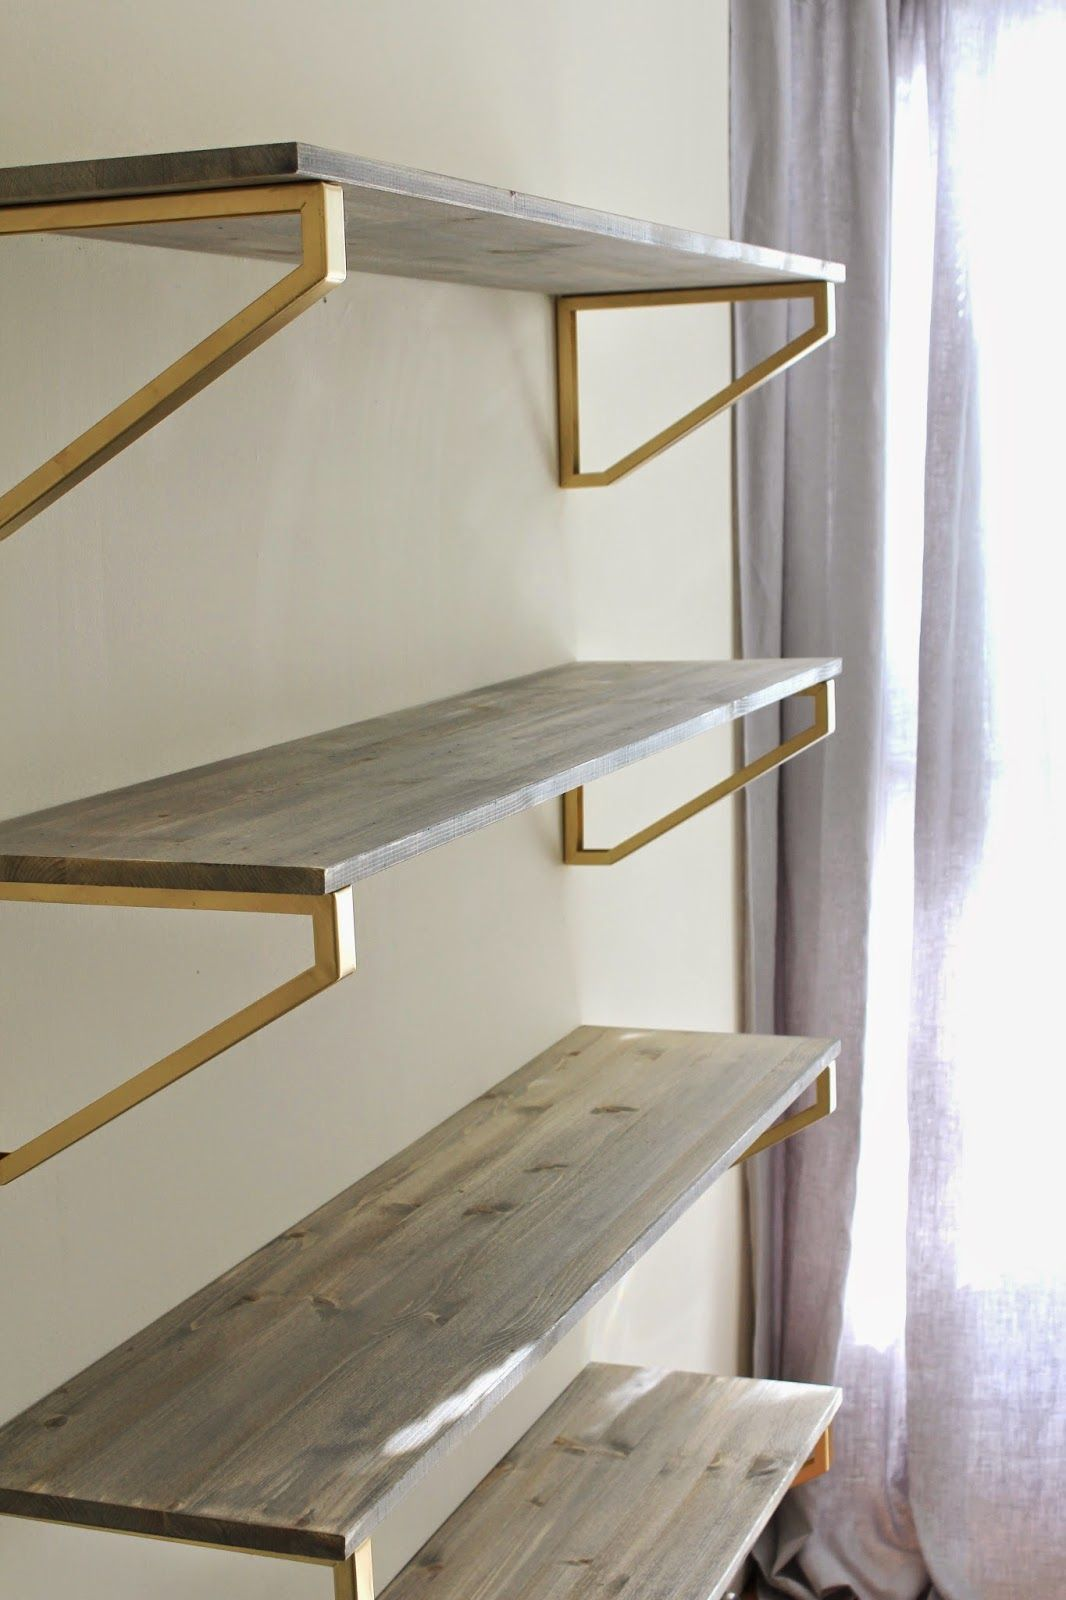 Cup Half Full Rustic Wood Shelf DIY [using Ikea EKBY